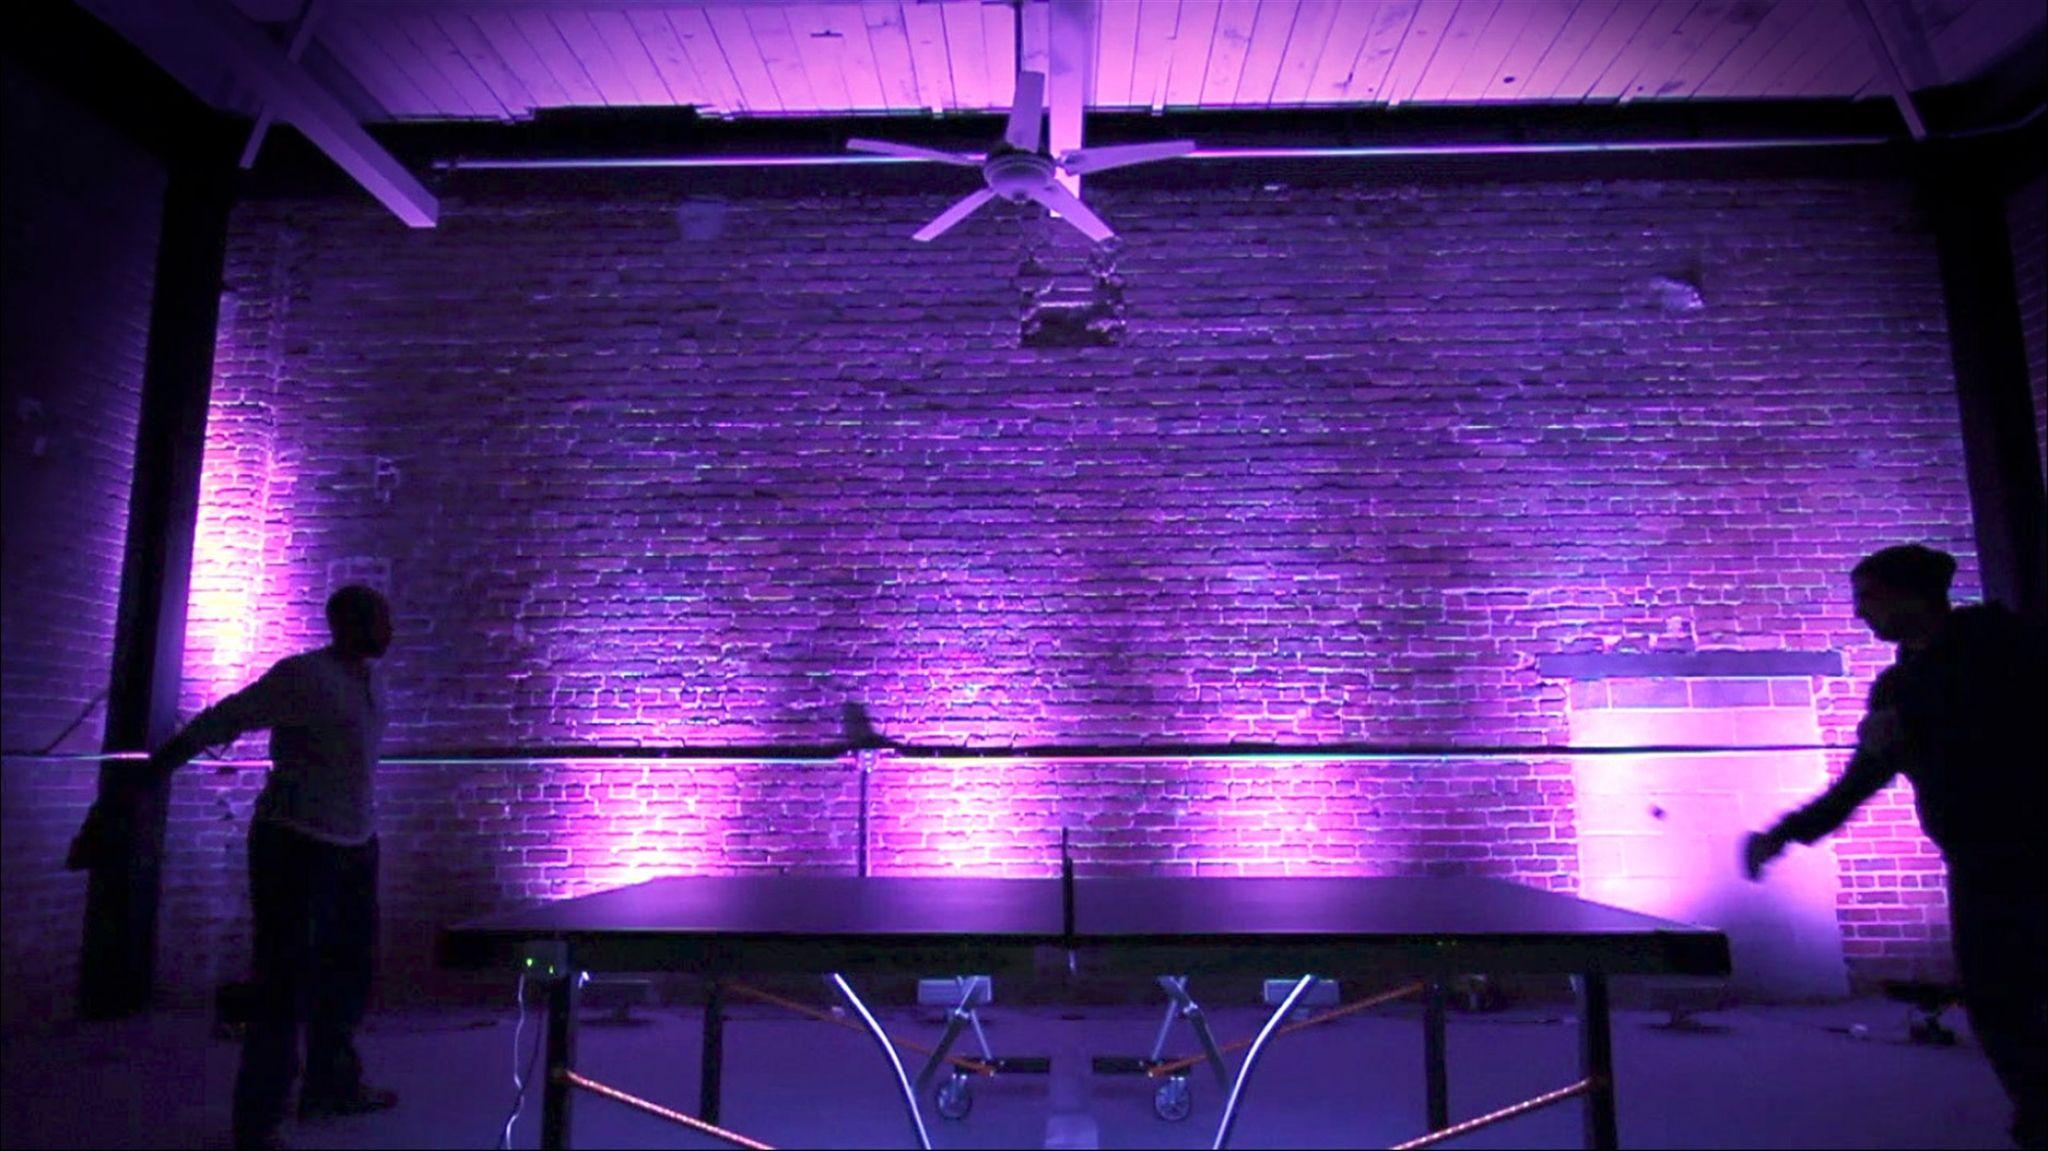 wall washing lighting. Outdoor Wall Wash Lighting - Top Rated Interior Paint Check More At Http:// Washing A